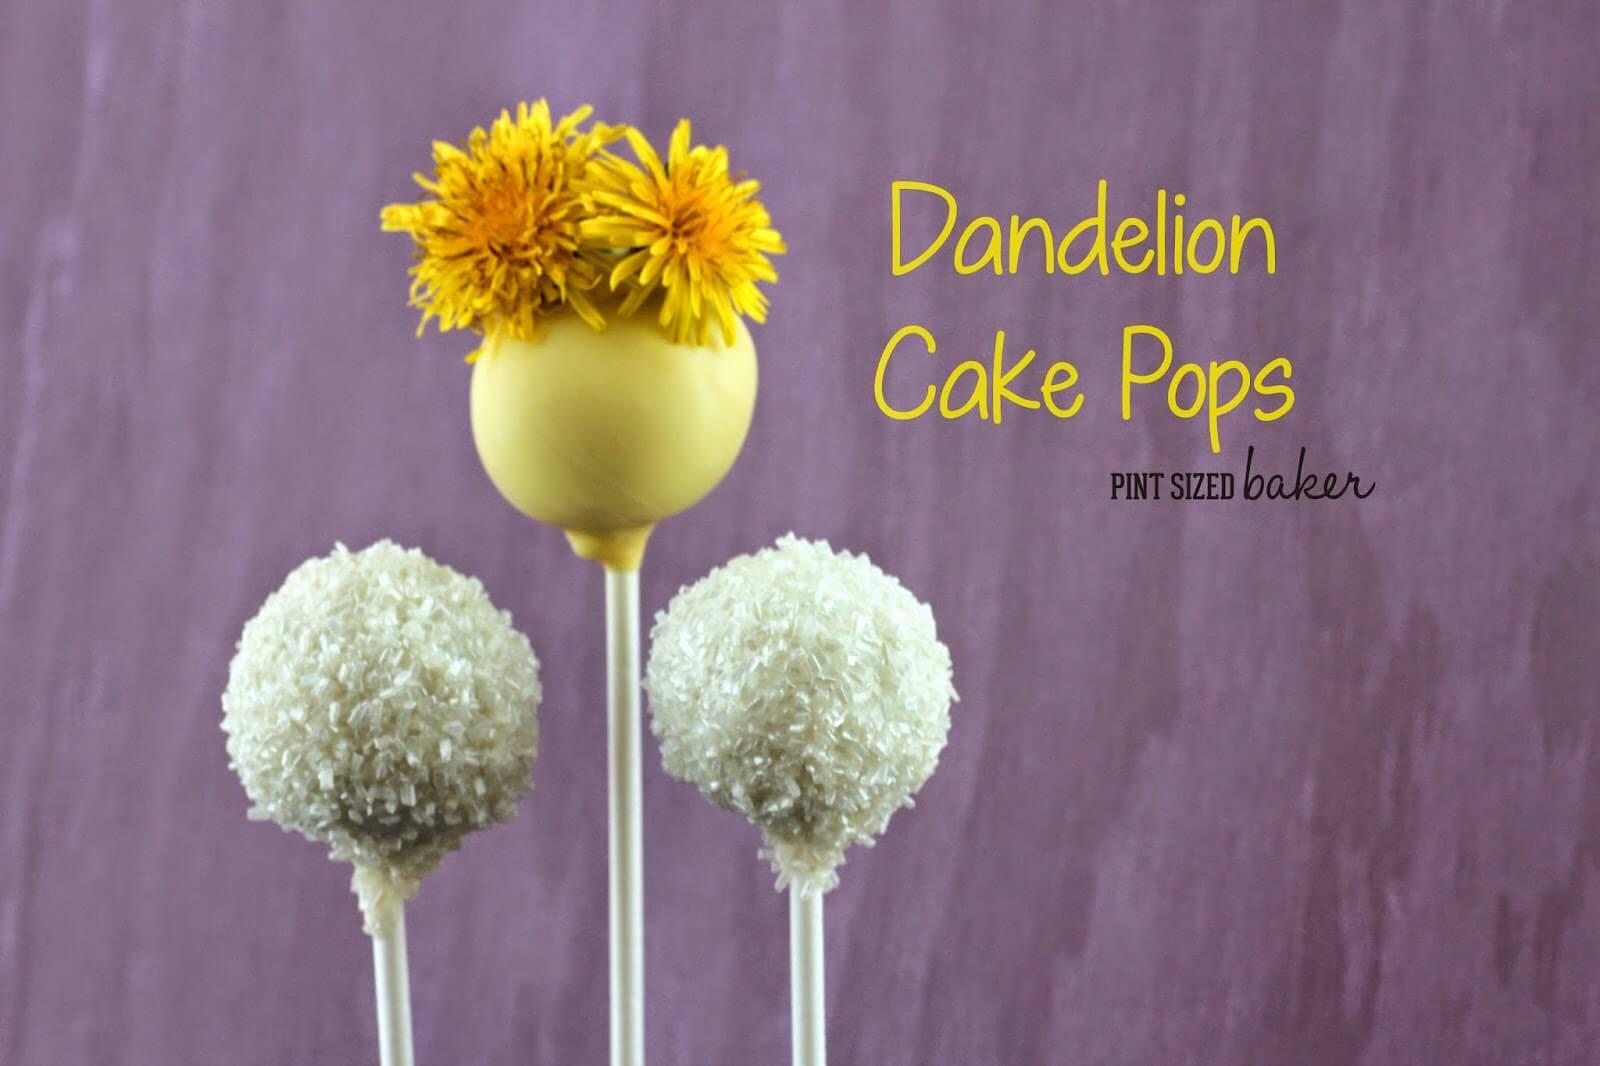 Dandelion Cake Pops